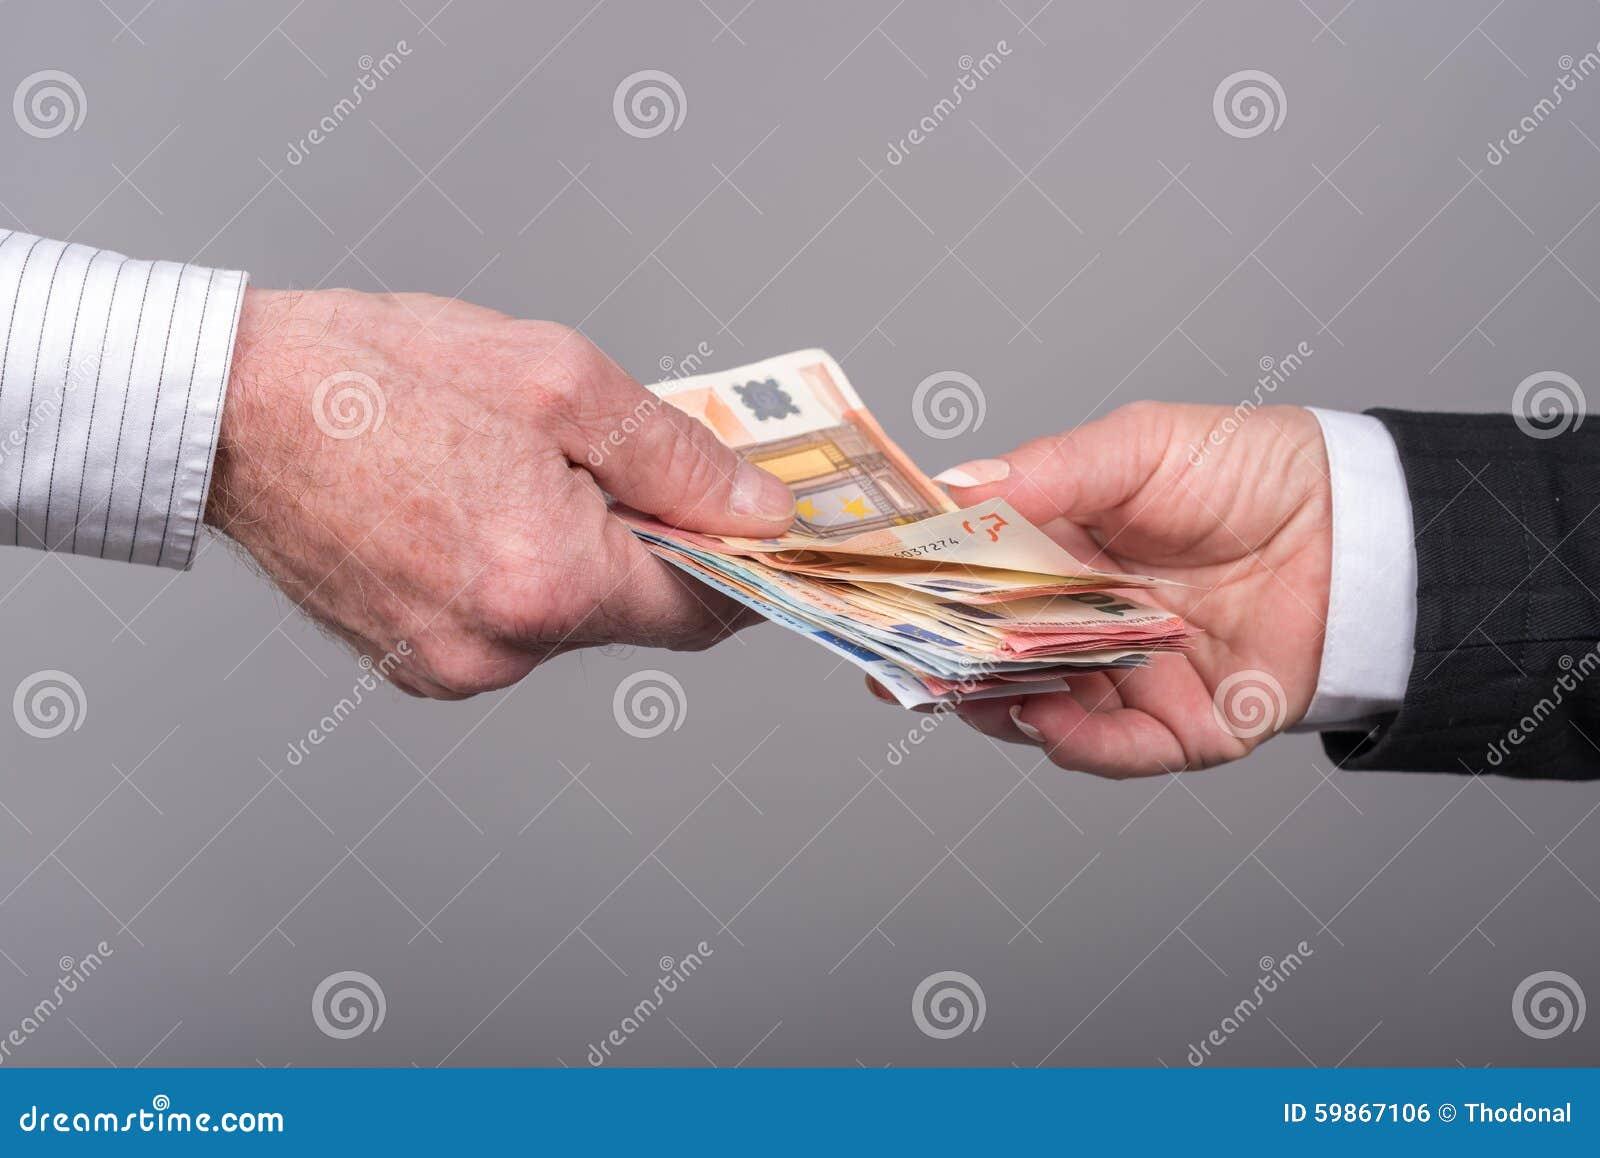 Money transfer stock photo. Image of money, banknote - 59867106